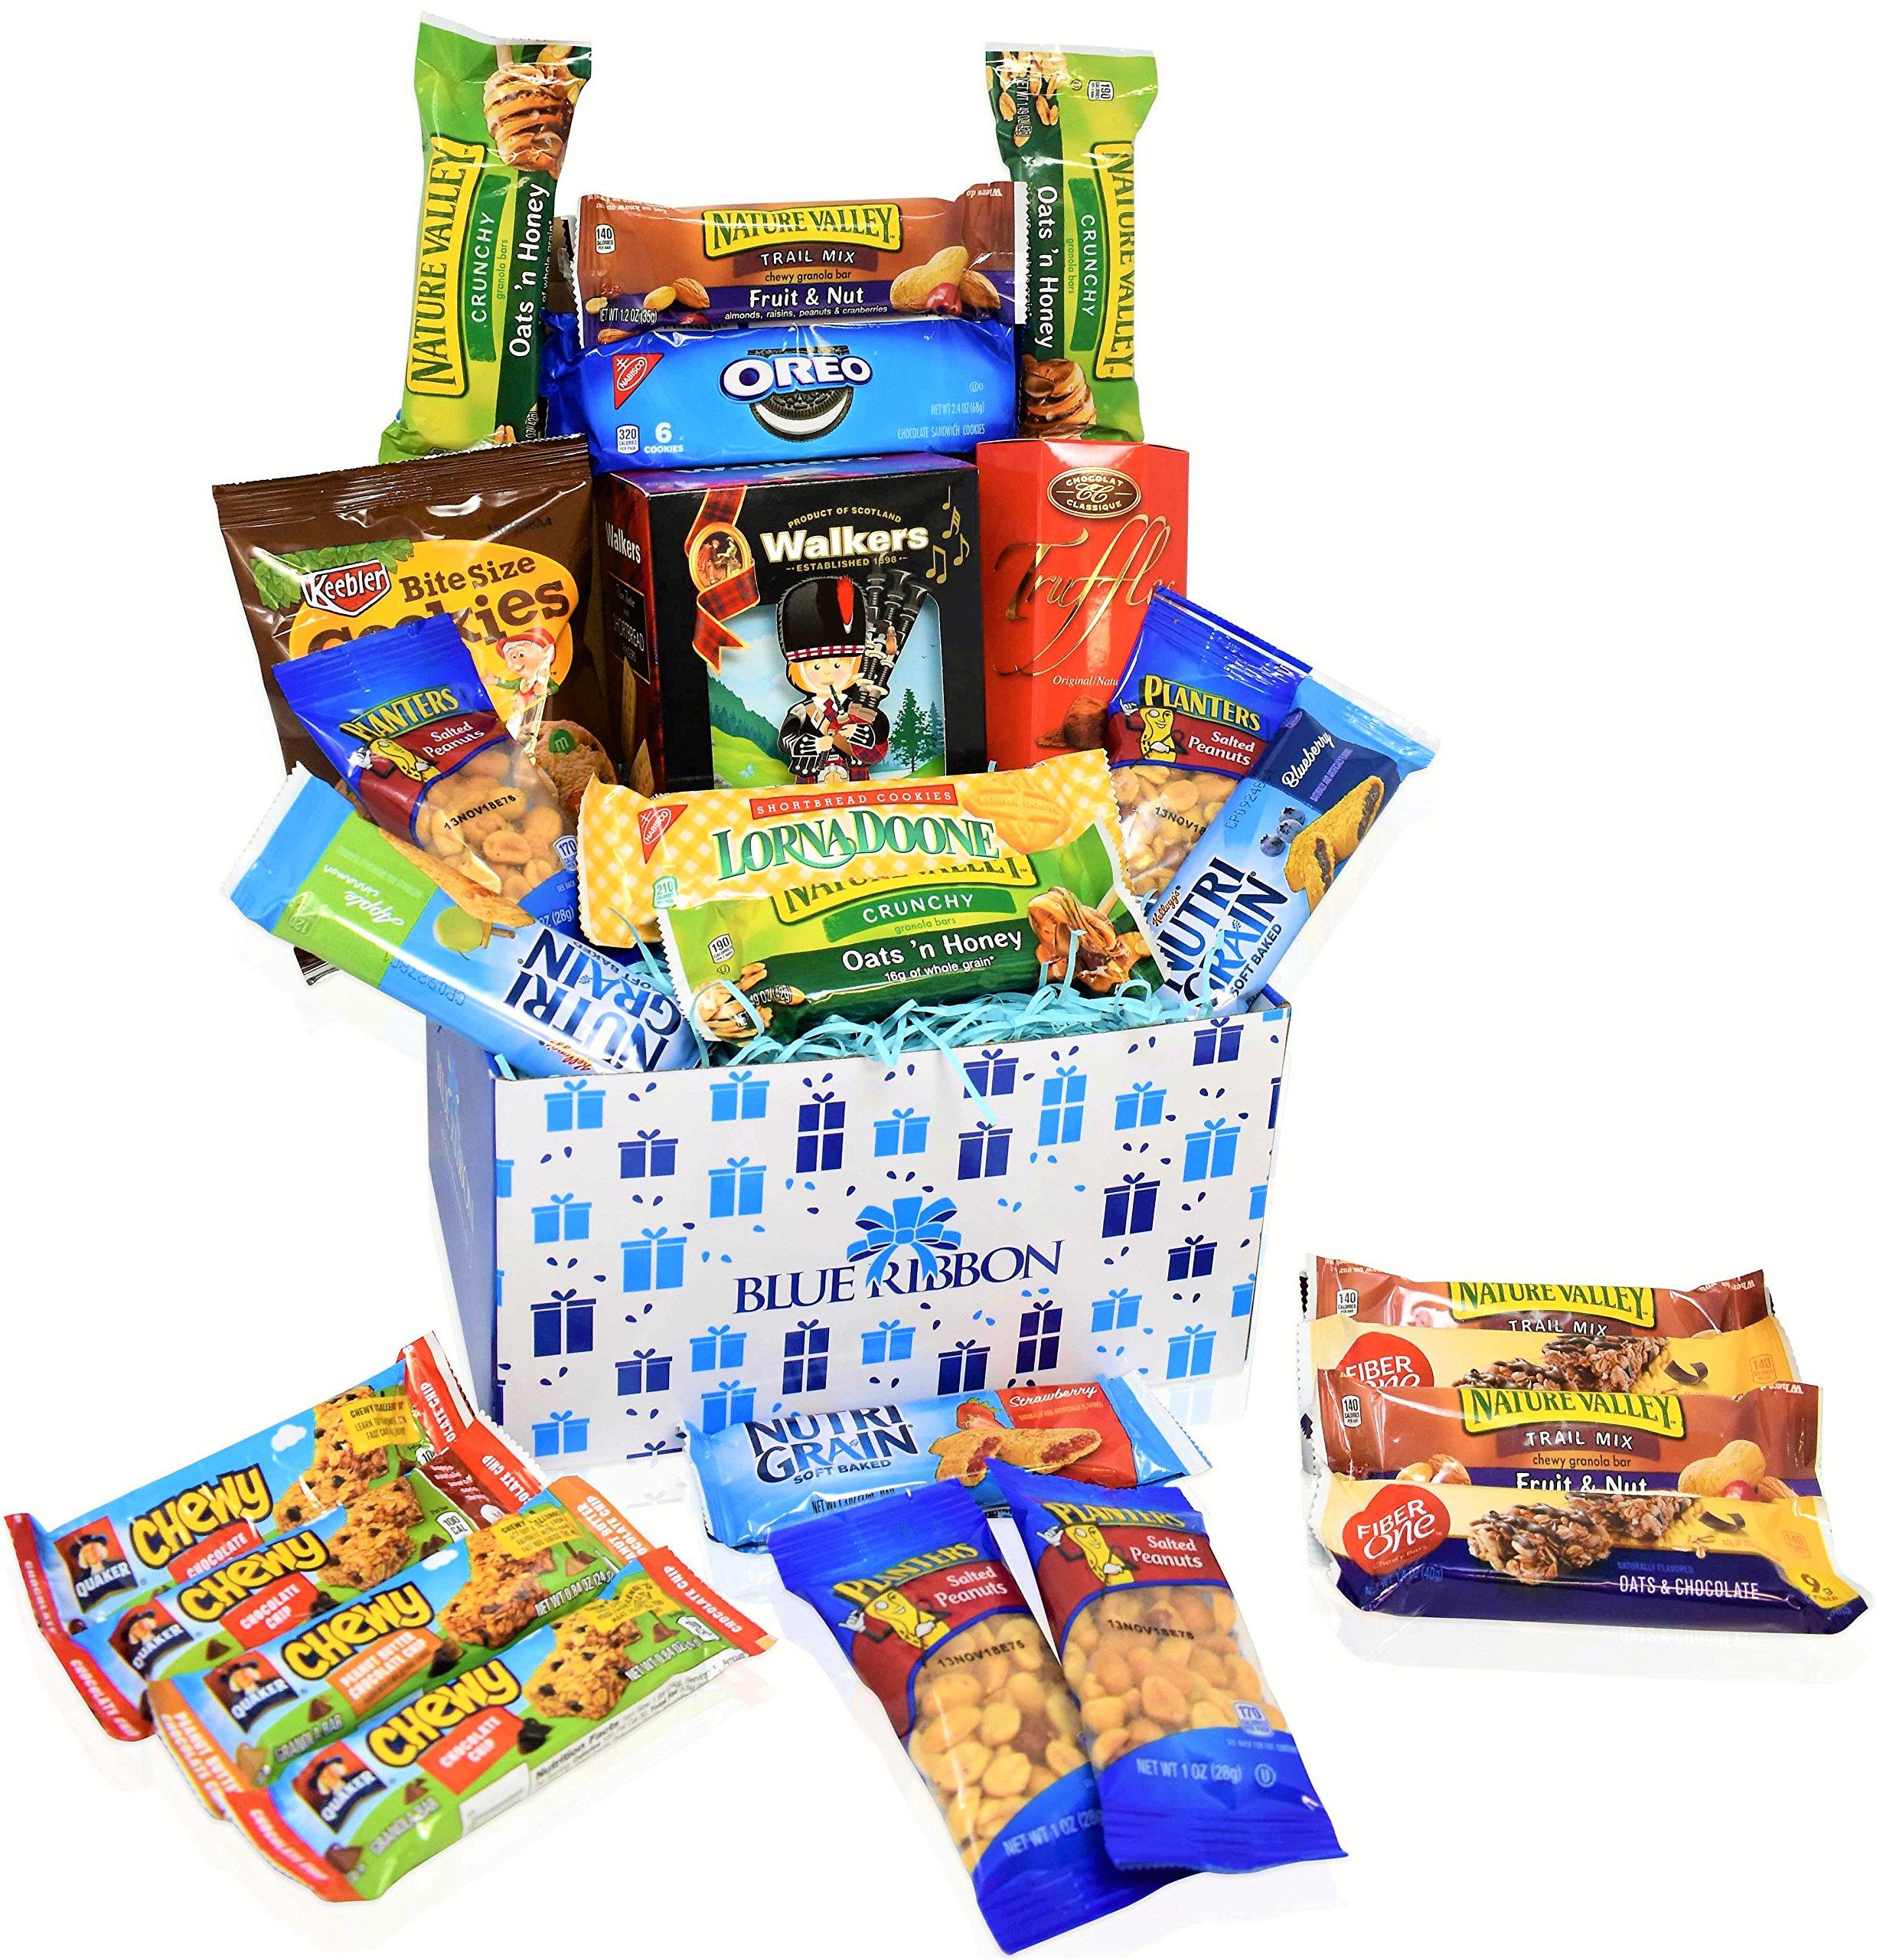 Care Package - Snacks, Nuts, Bars, Truffles,Walker Sortbread Cookies - Great Gift Basket Variety by Blue Ribbon